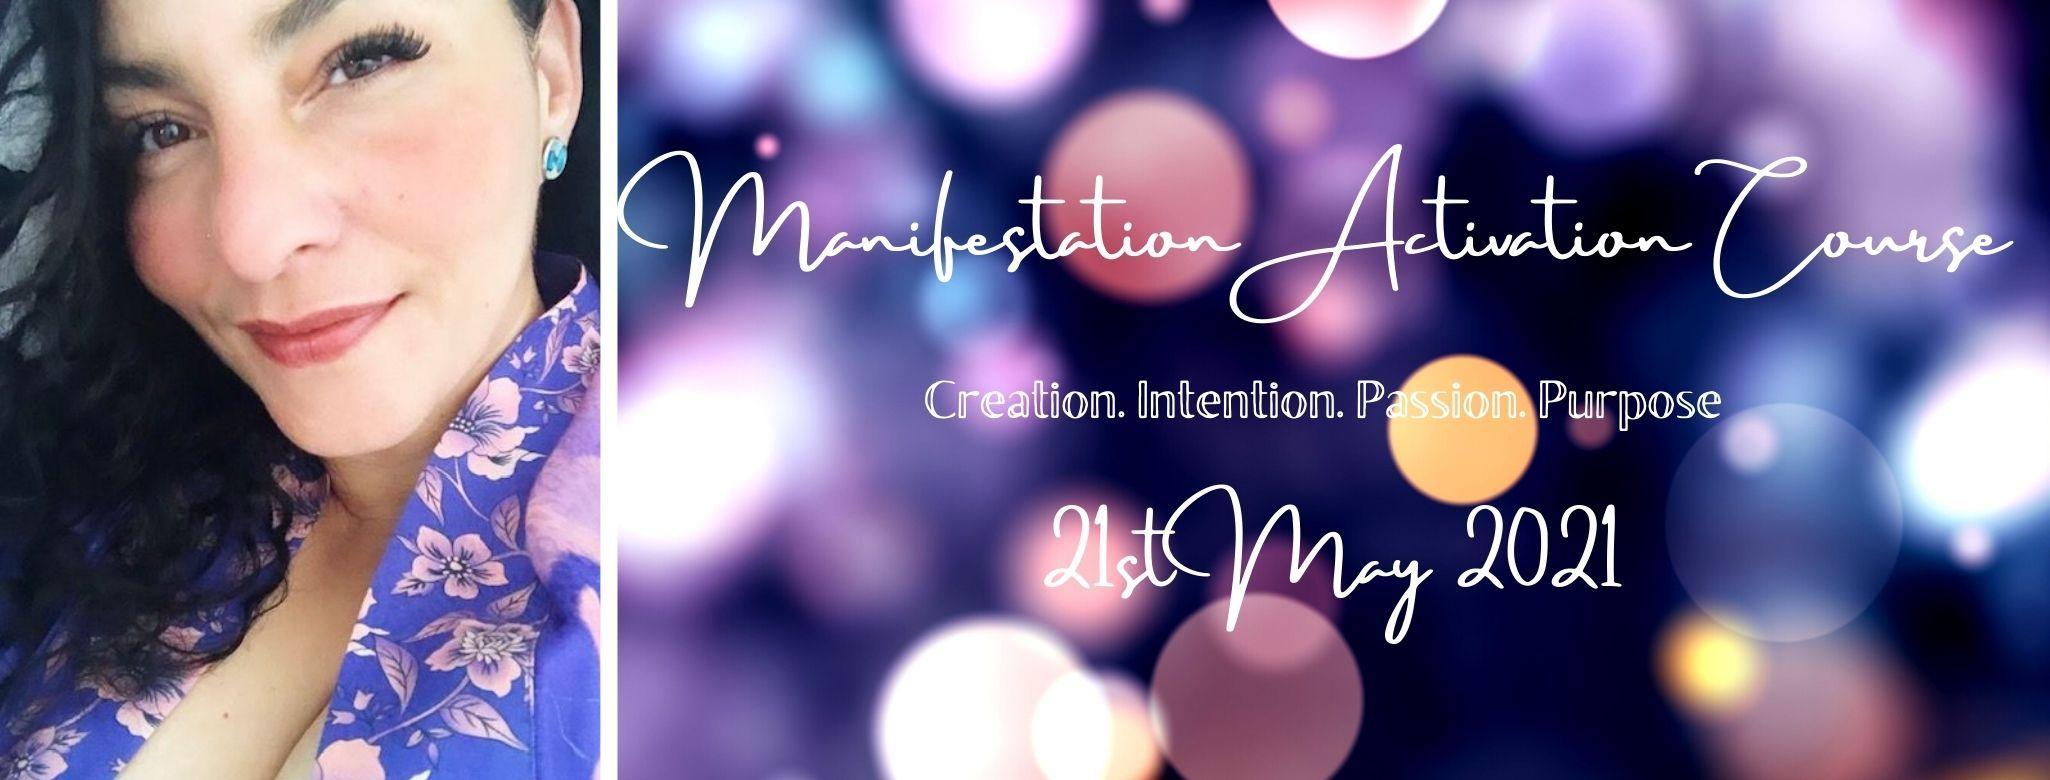 manifestation-may-banner.jpg